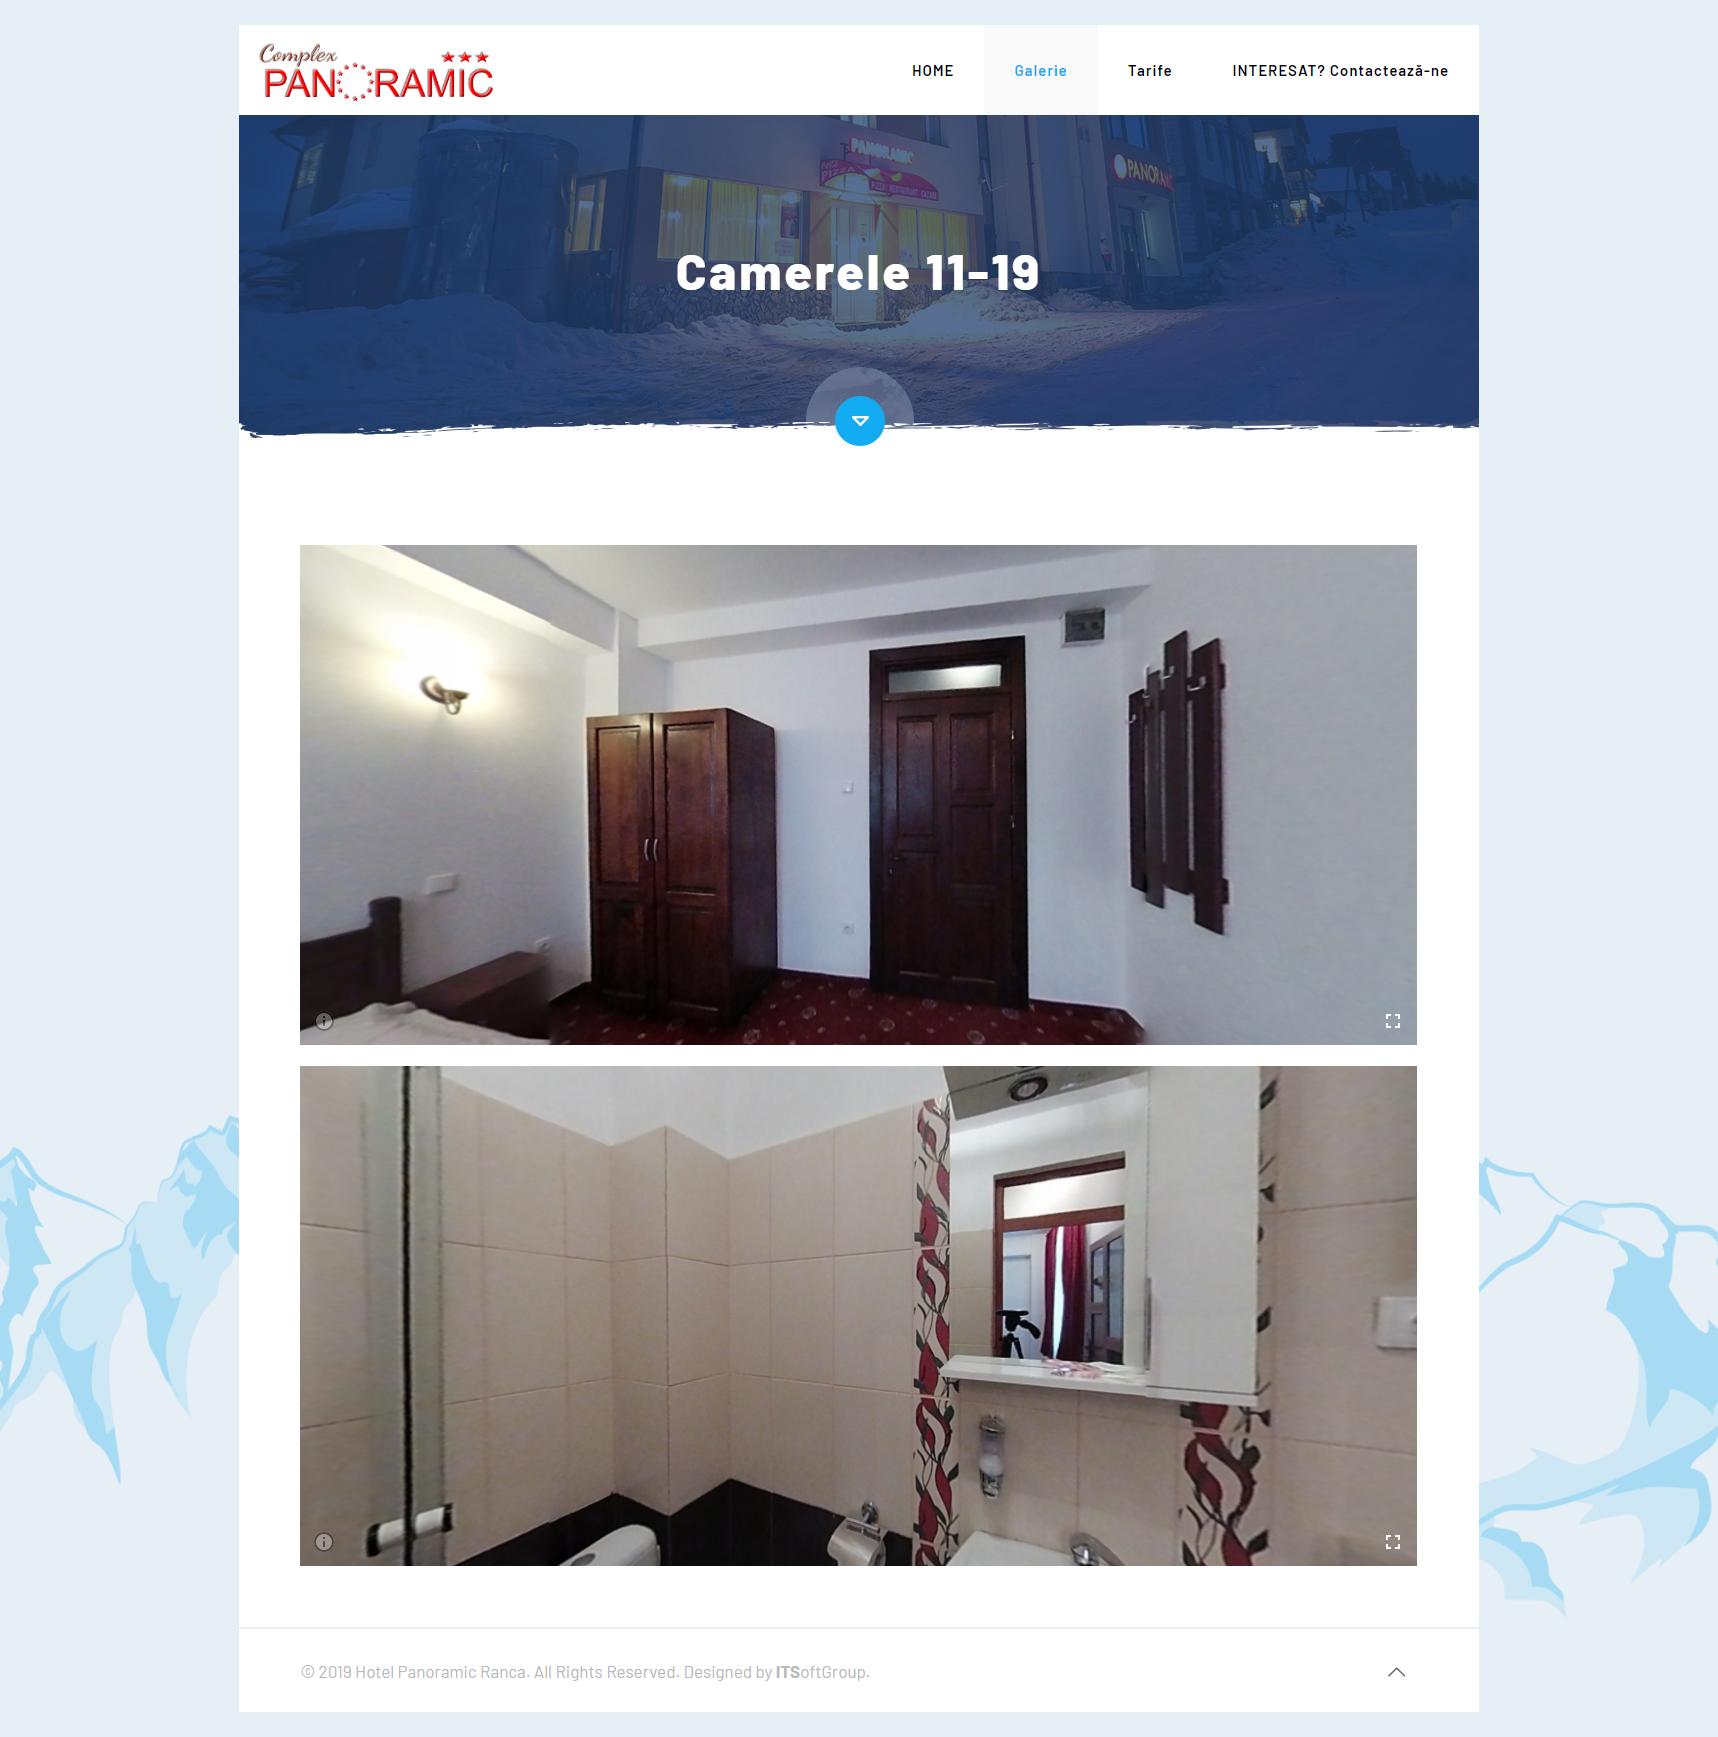 screencapture-rancapanoramic-ro-camerele-11-20-2019-10-01-14_17_14